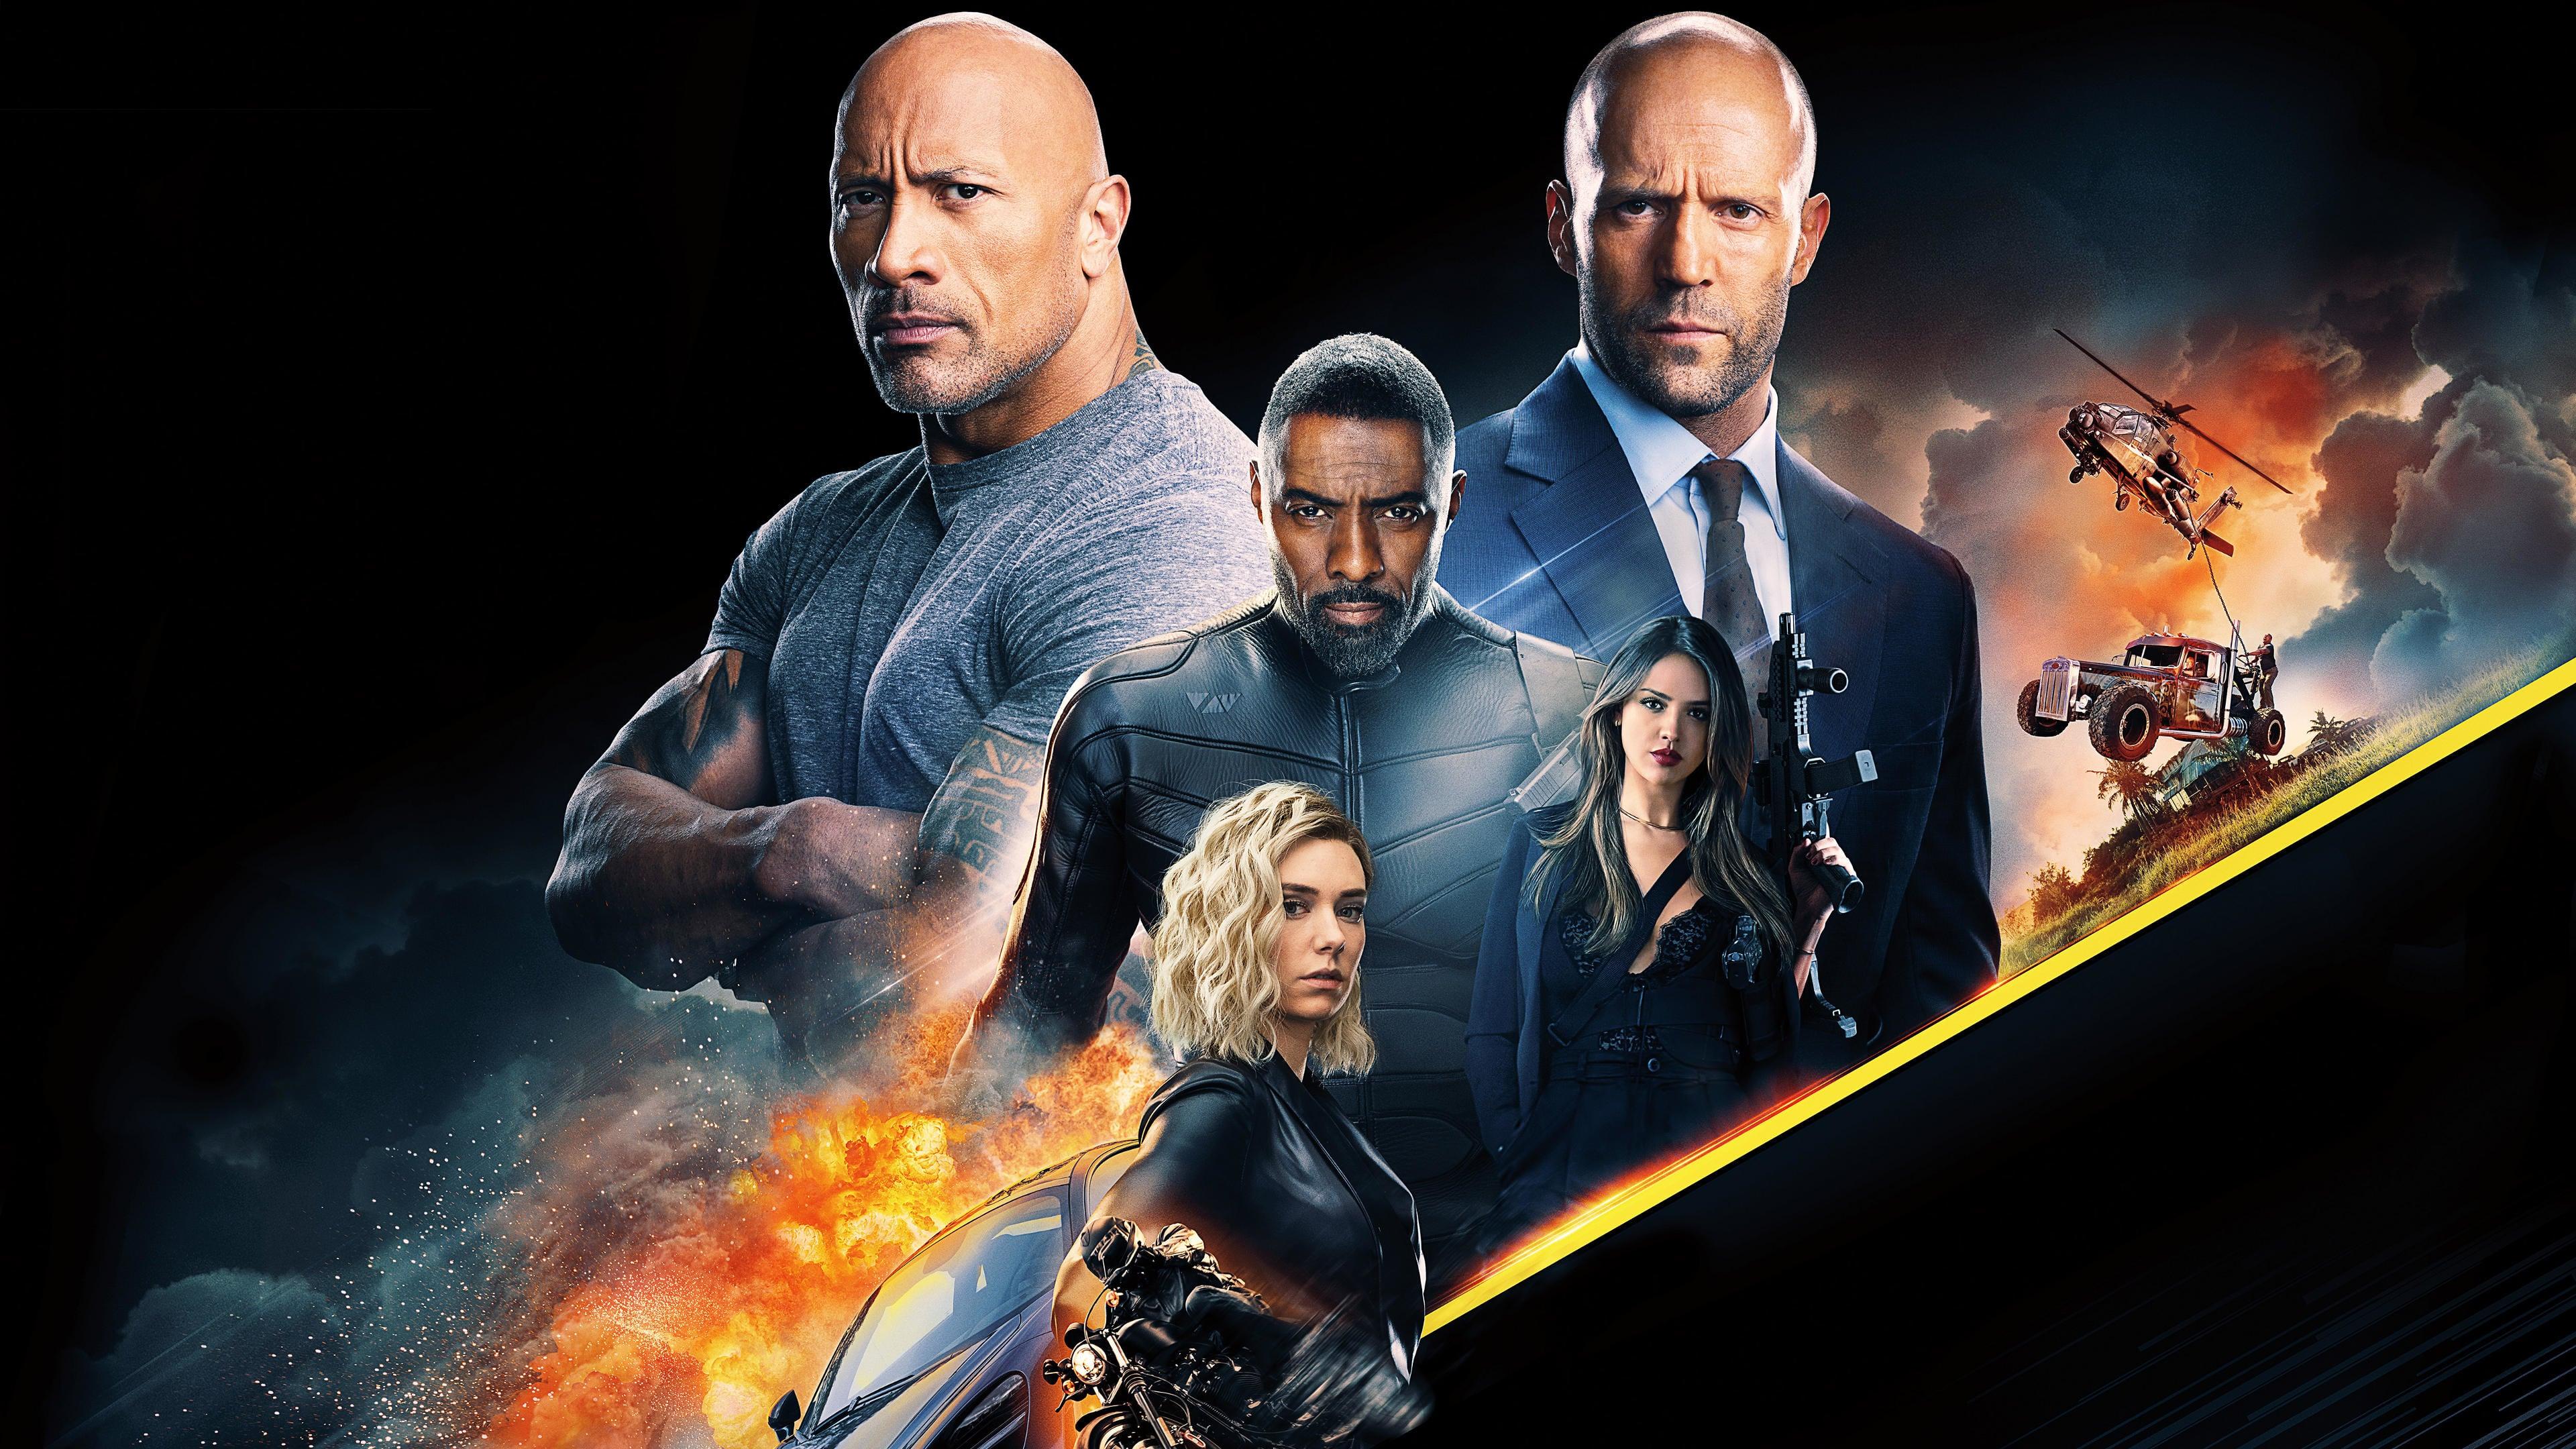 Regarder Fast & Furious : Hobbs & Shaw en streaming gratuit